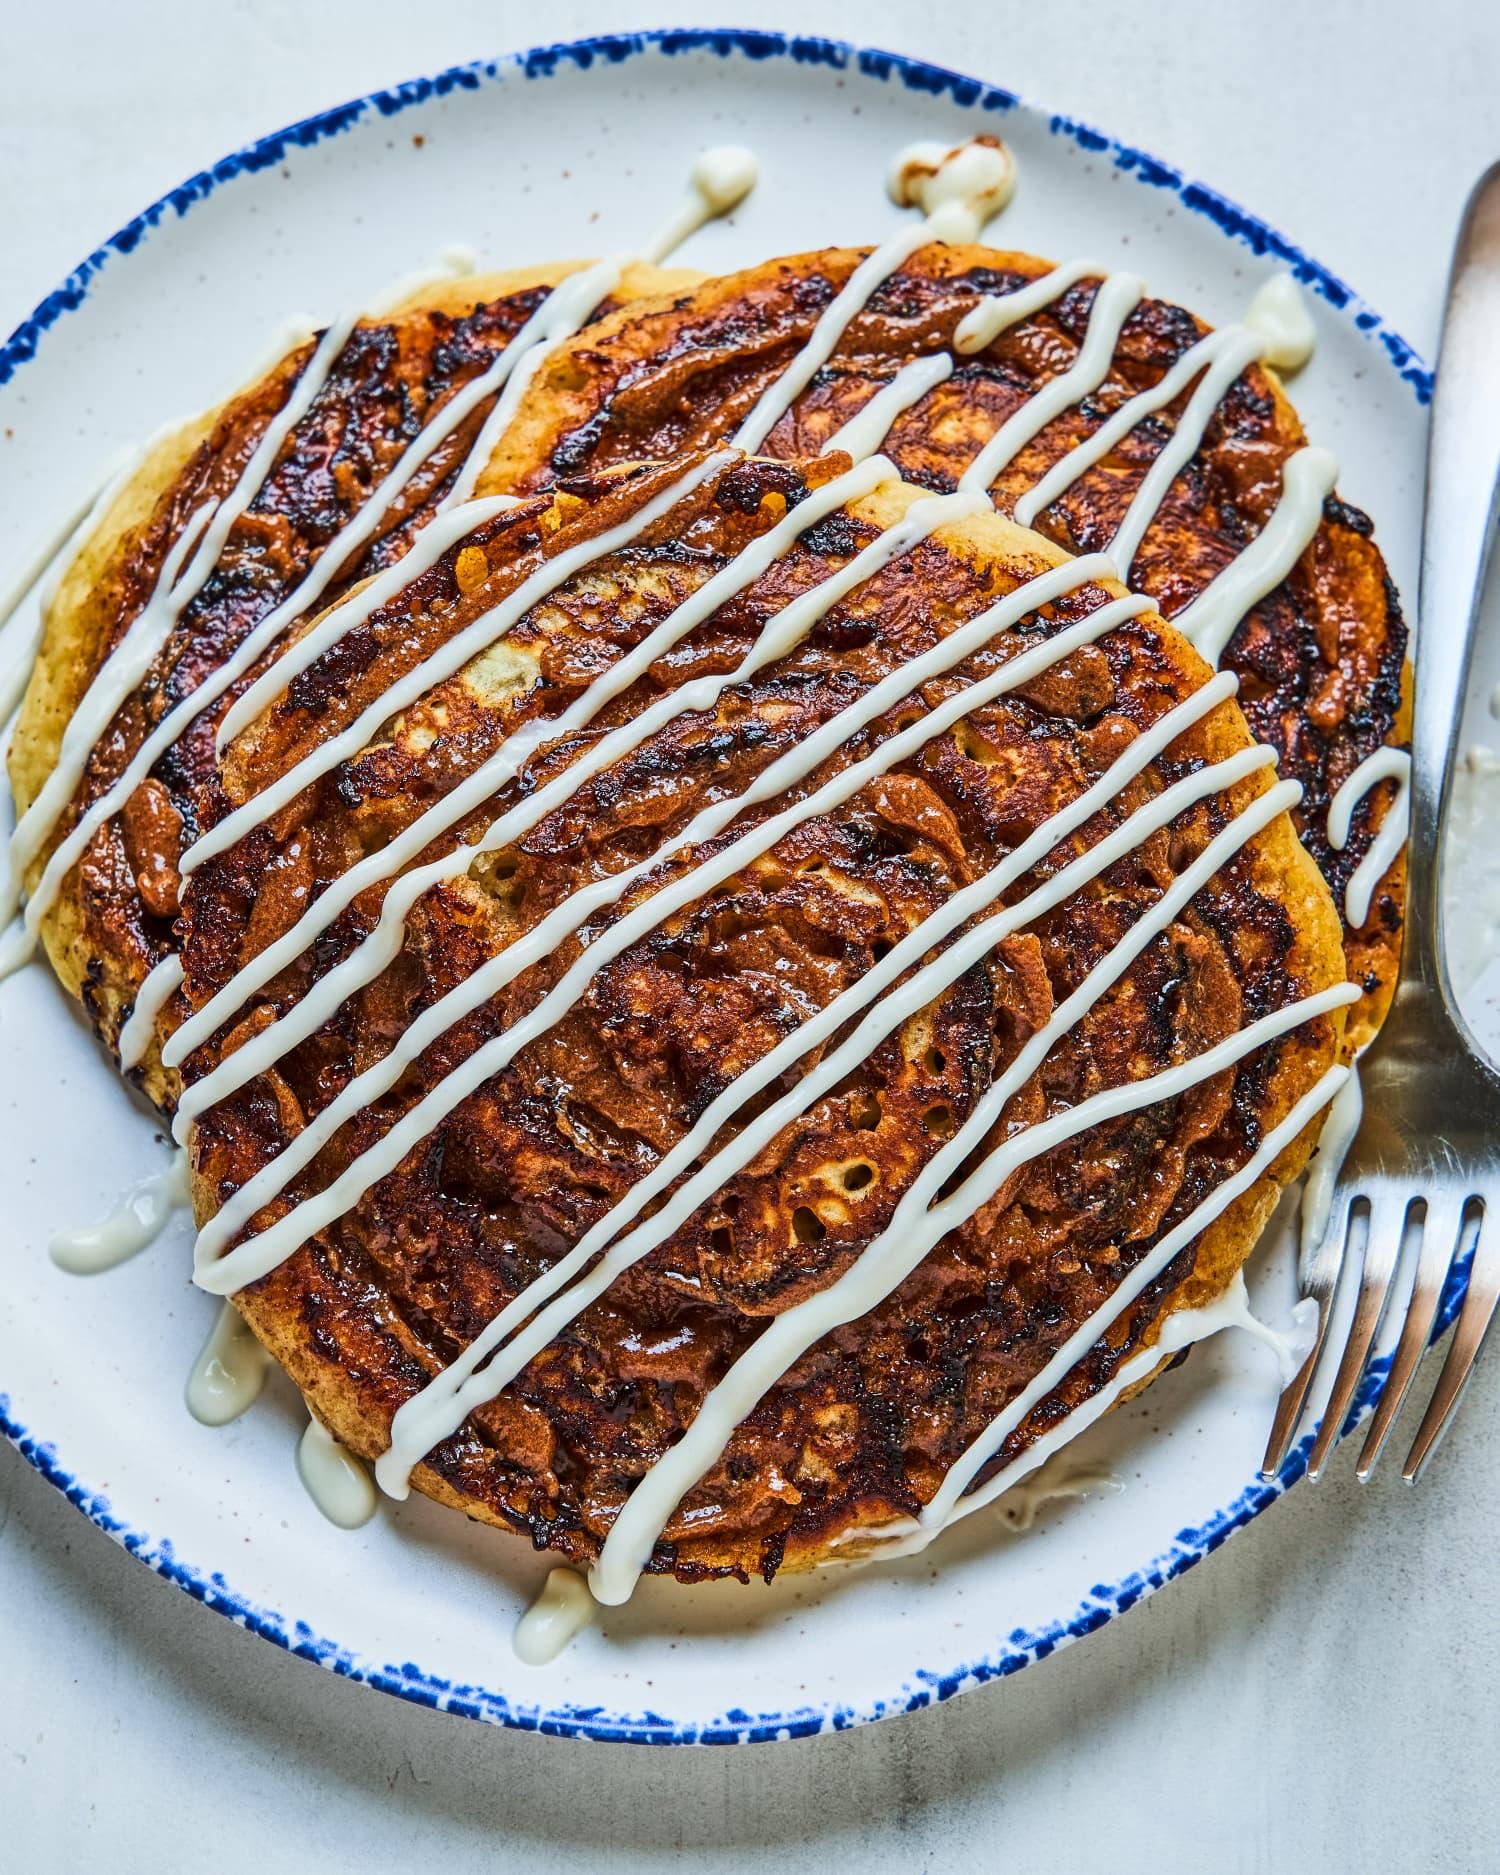 Cinnamon Roll Pancakes Are Our Breakfast Dreams Come True